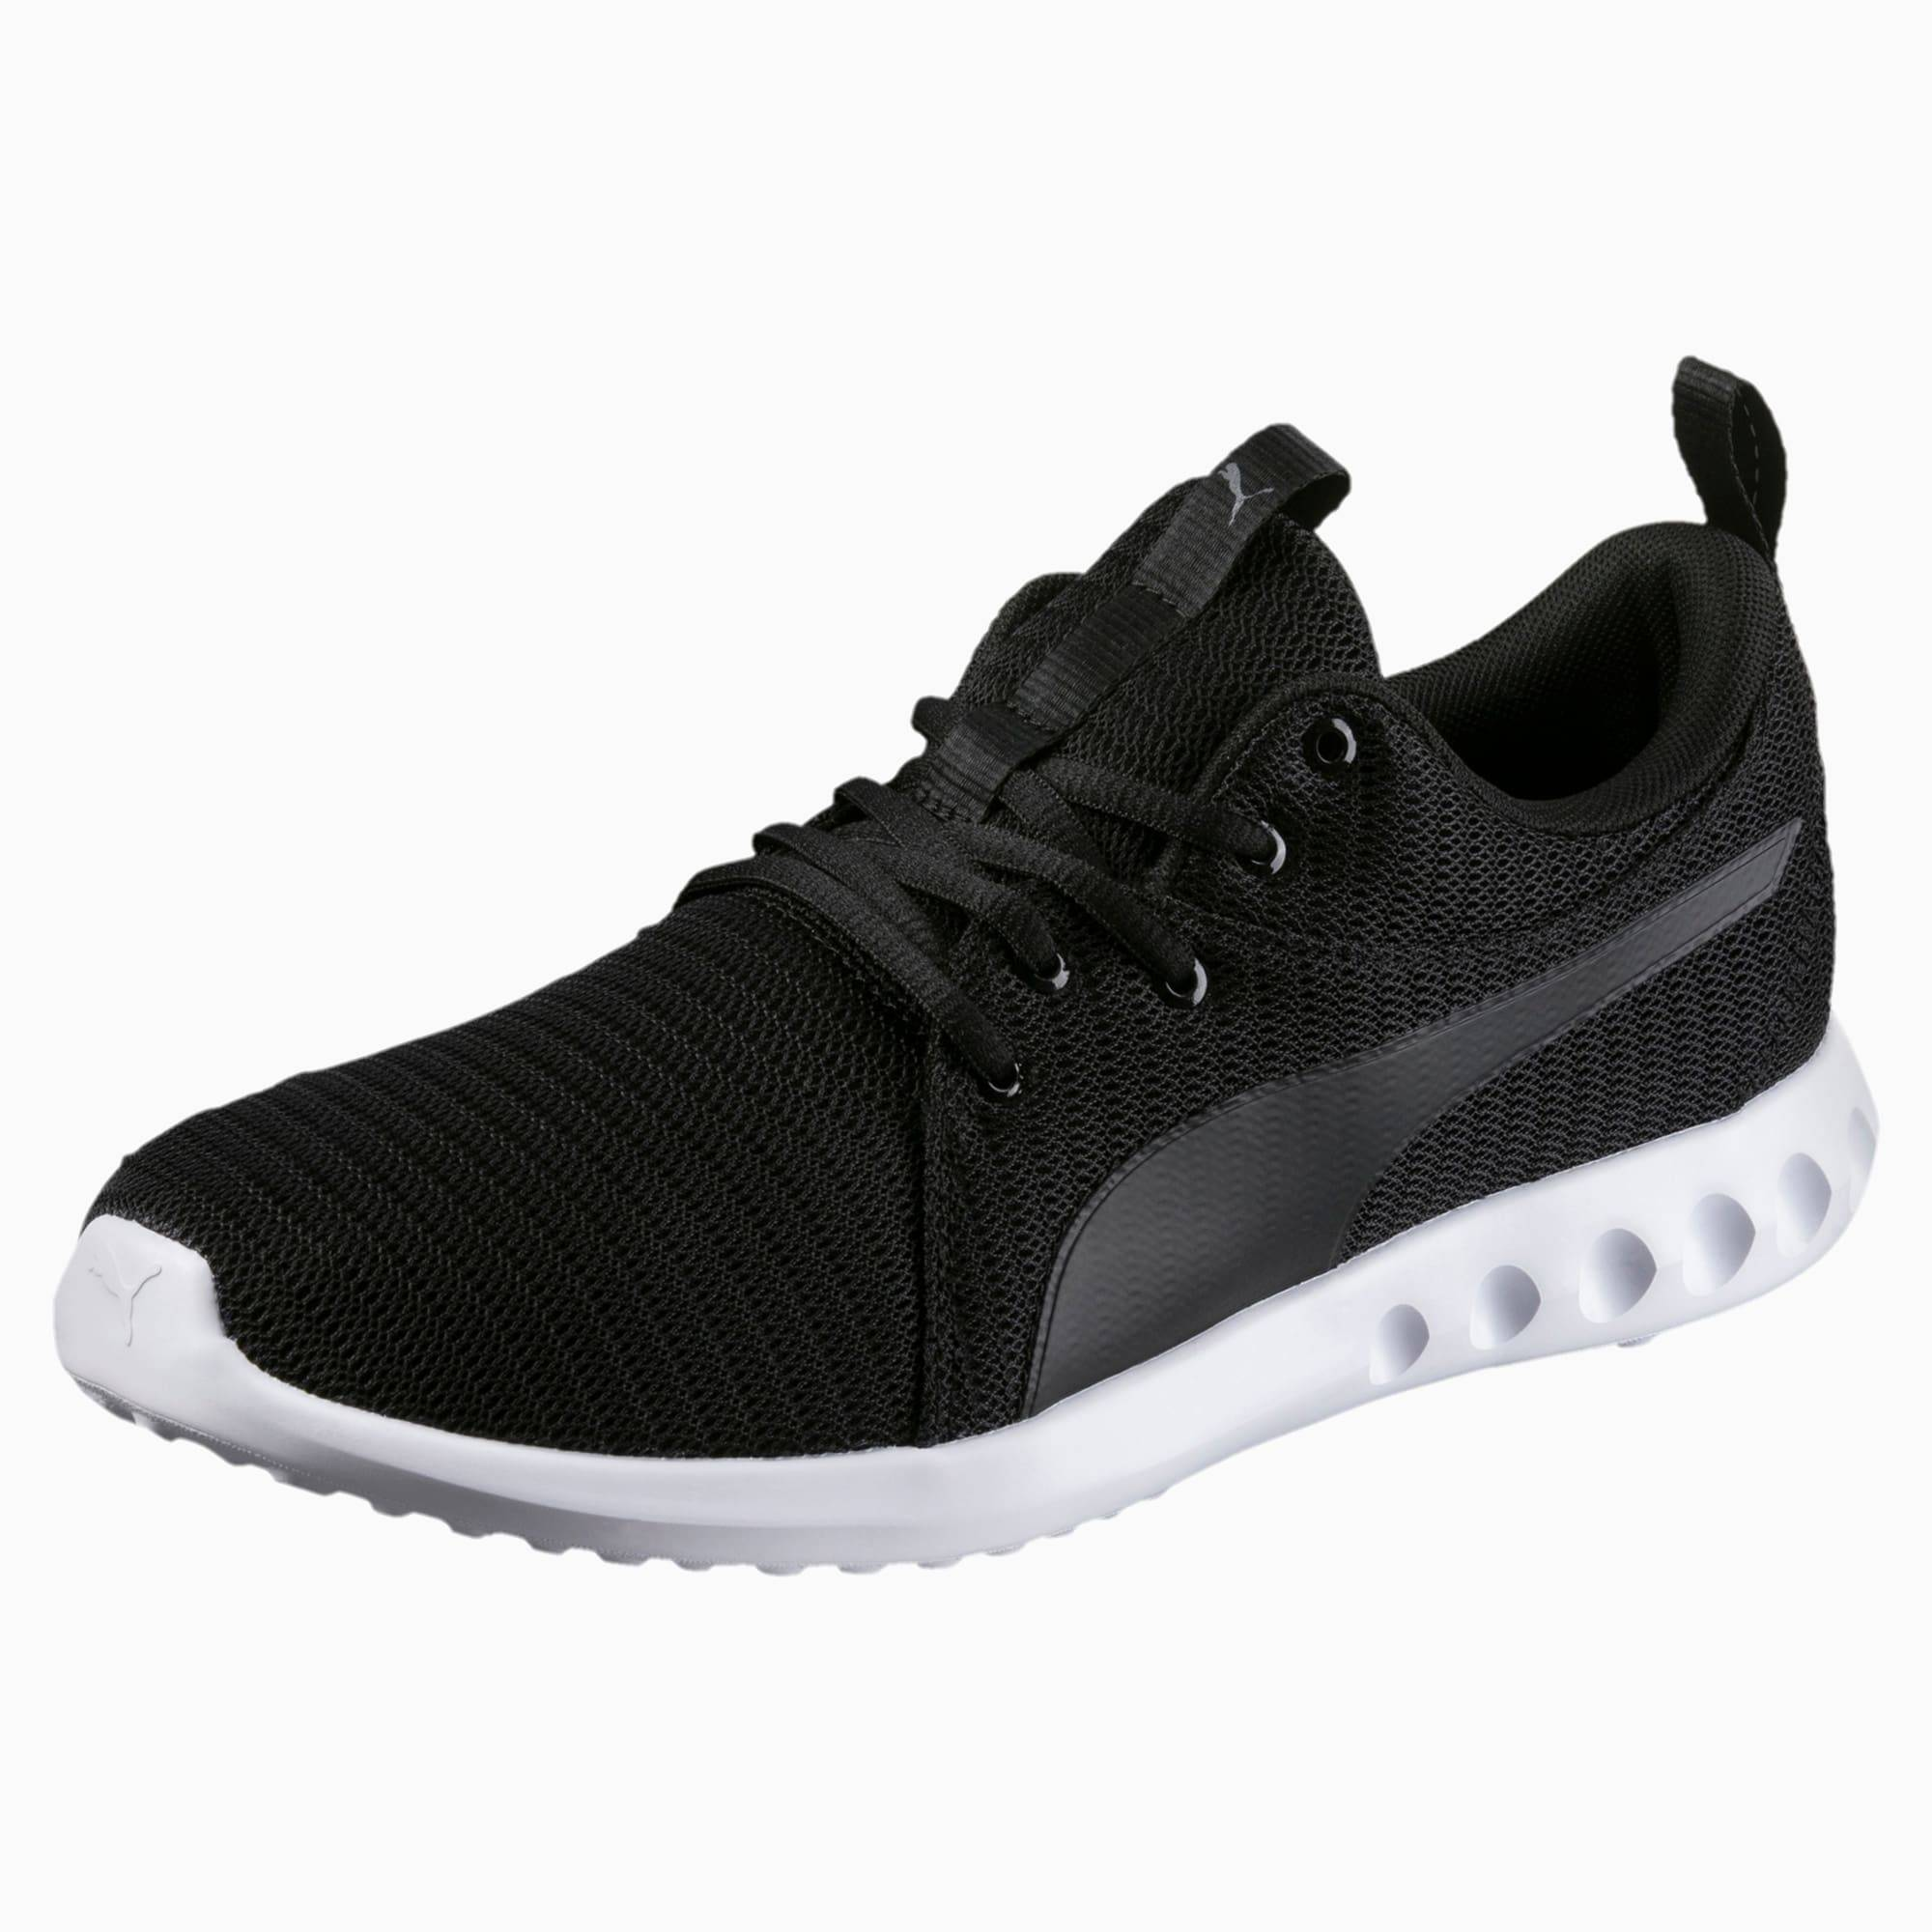 Puma Carson 2 Men's Trainers,  Grey, size 8, Shoes